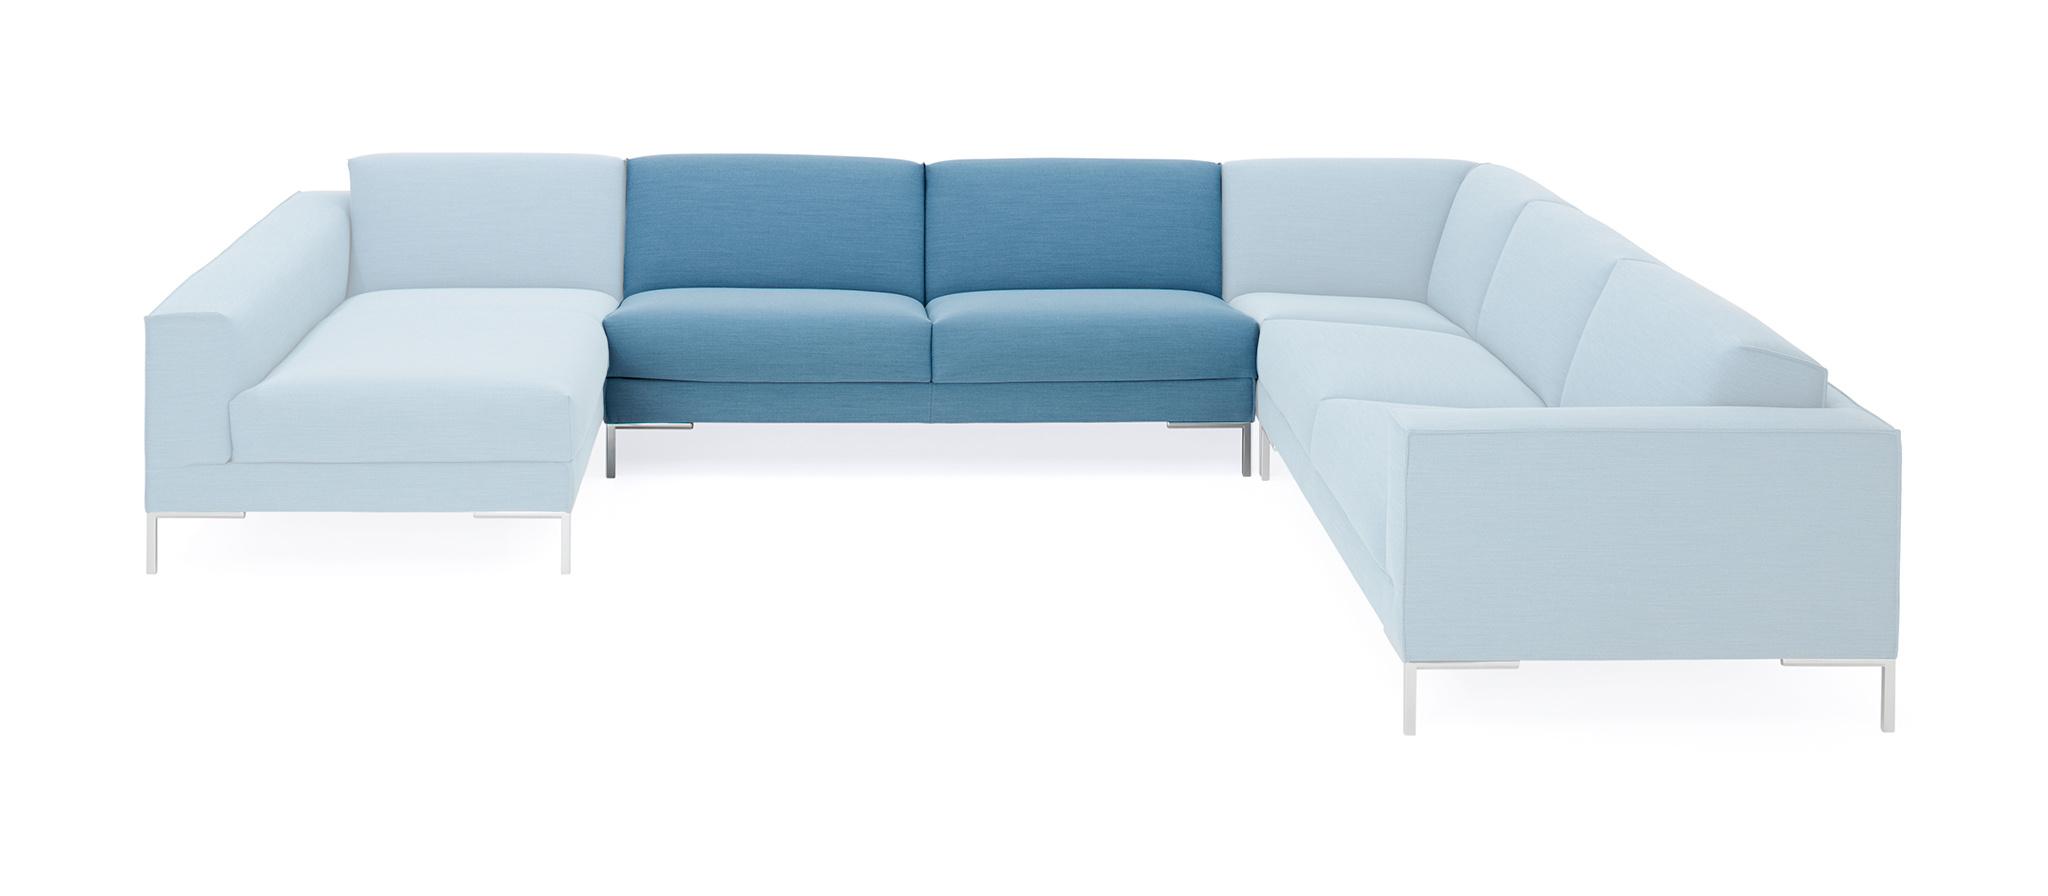 Design On Stock Aikon.Contemporary Armless Sofa Aikon 0 Arm Dutch Modern Furniture